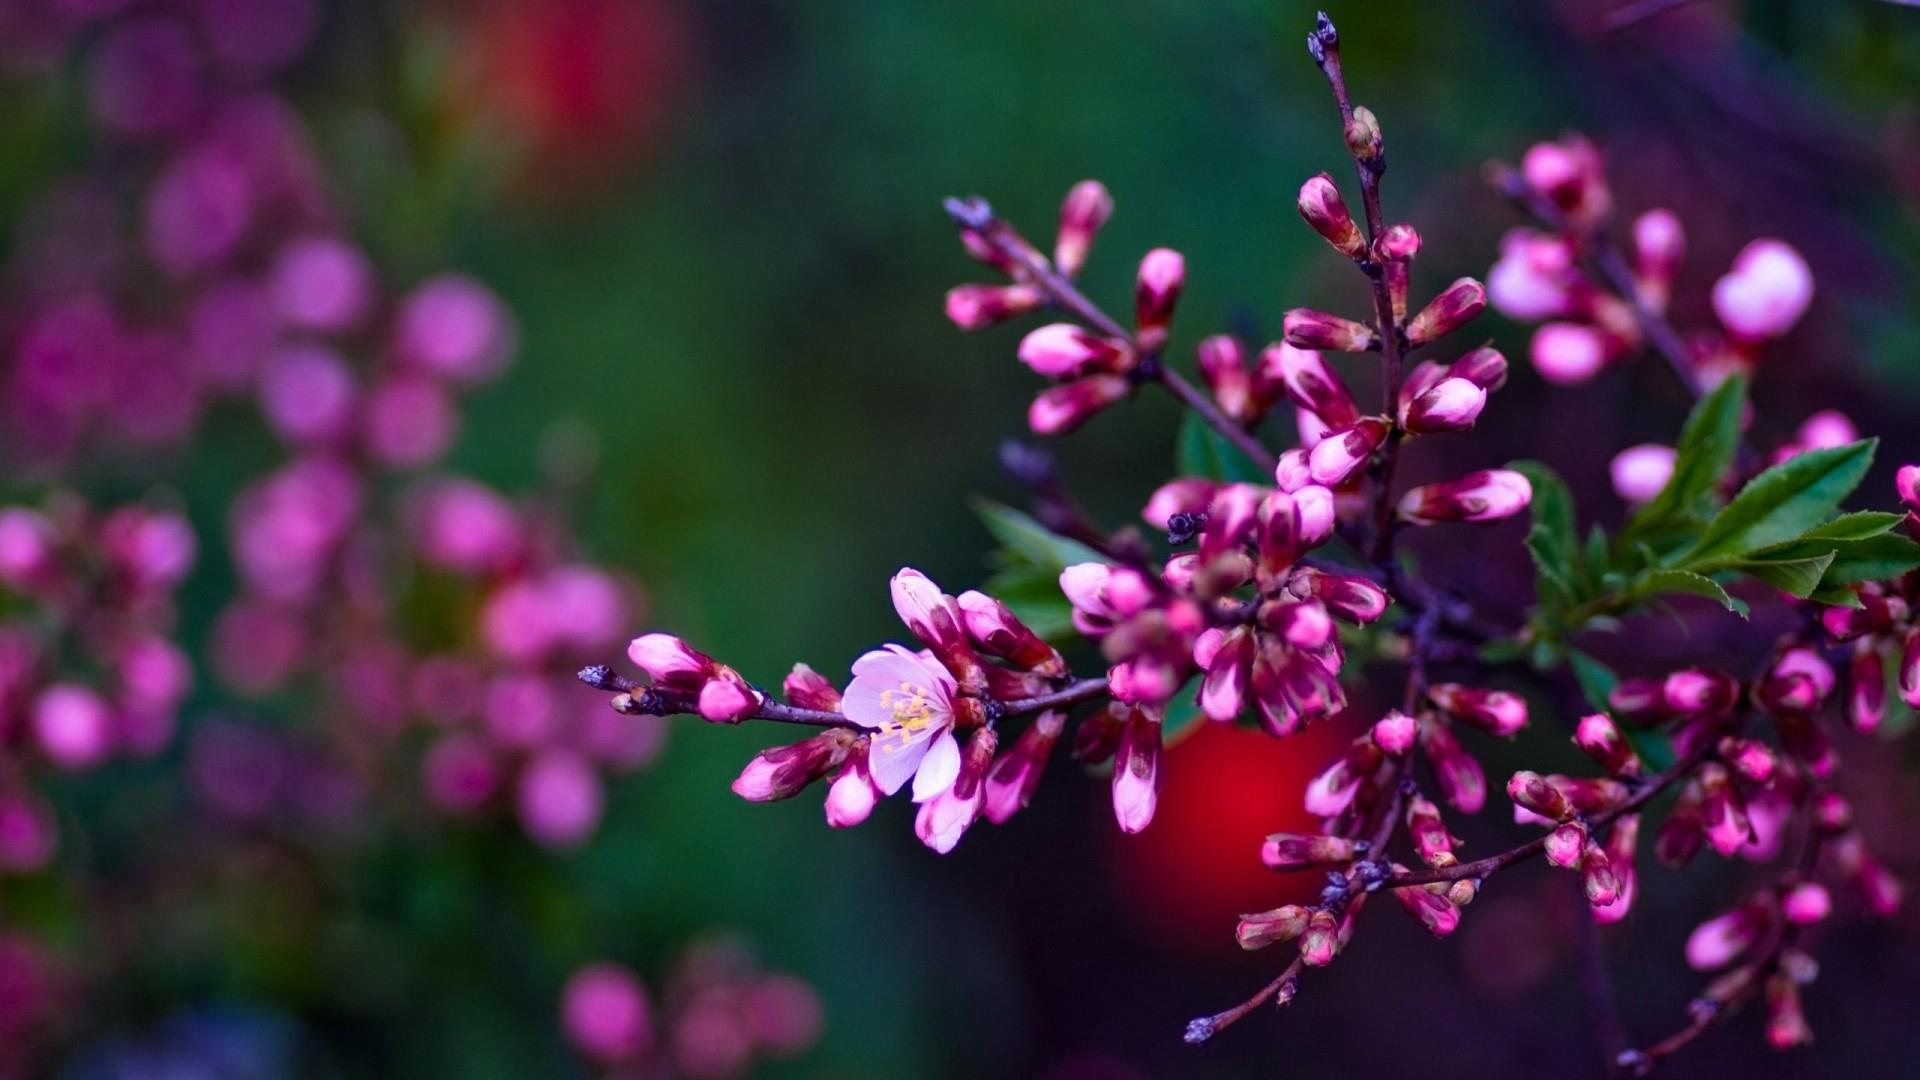 spring flowers backgrounds hd | pixelstalk